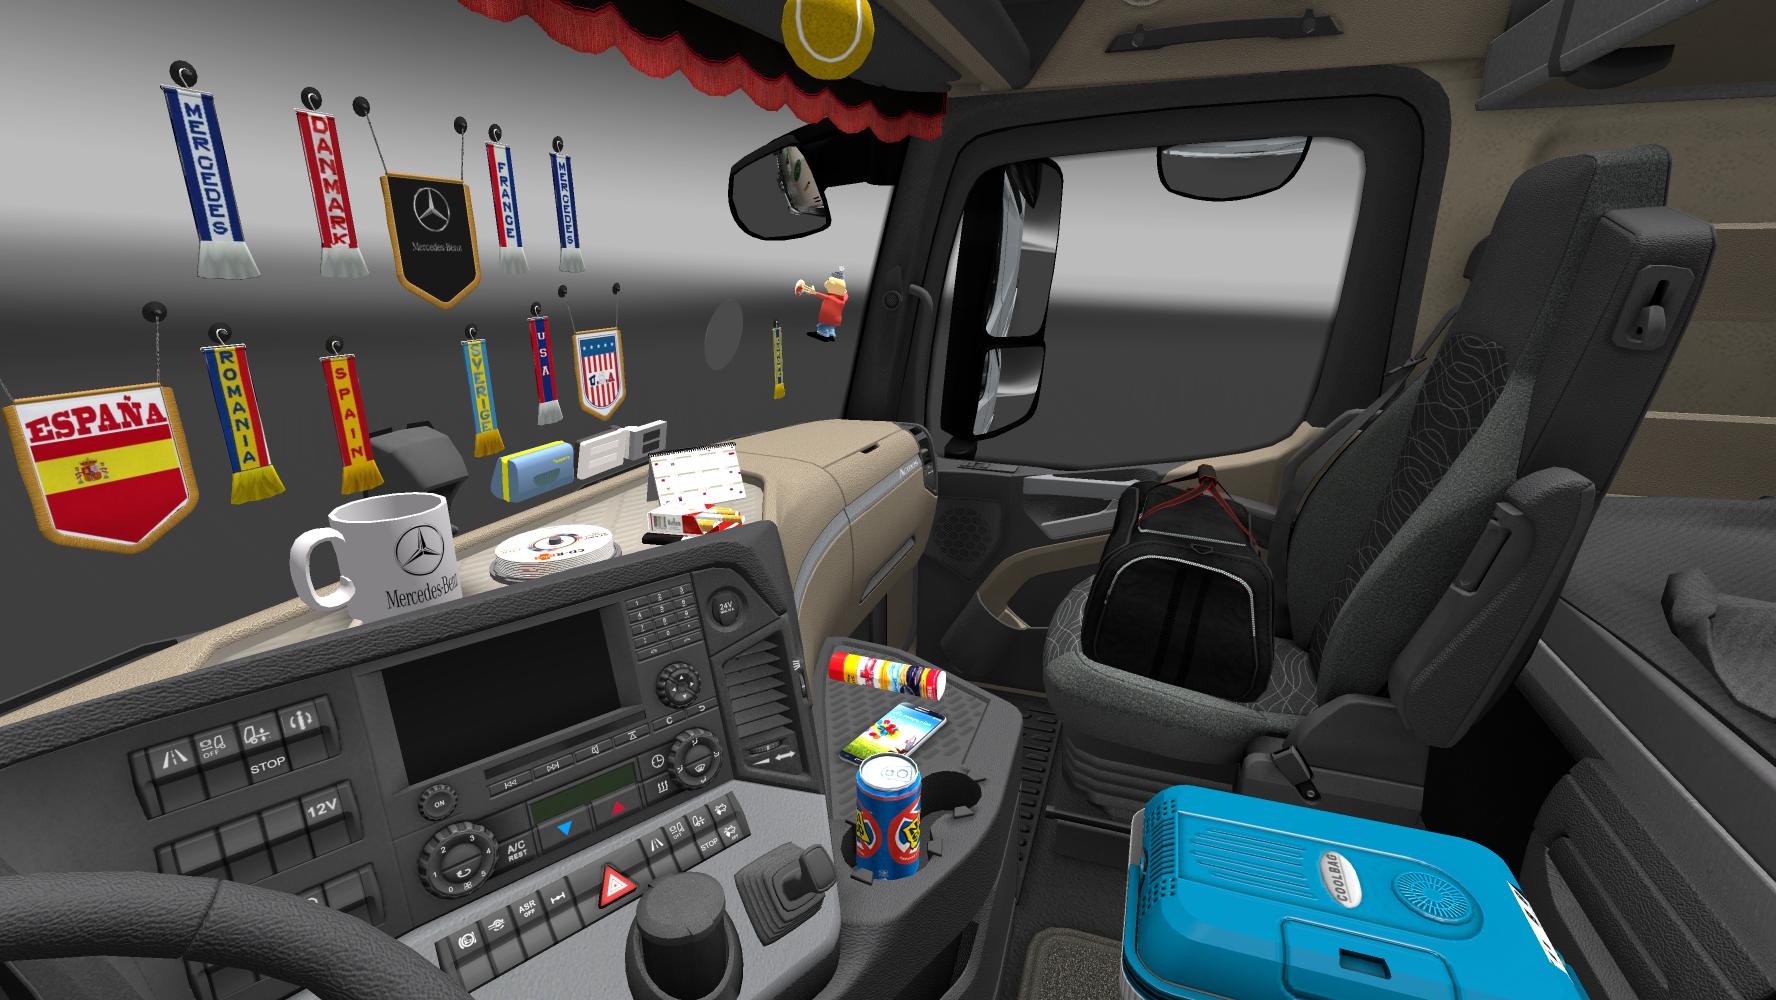 Читы На Деньги Euro Truck Simulator 2 X64